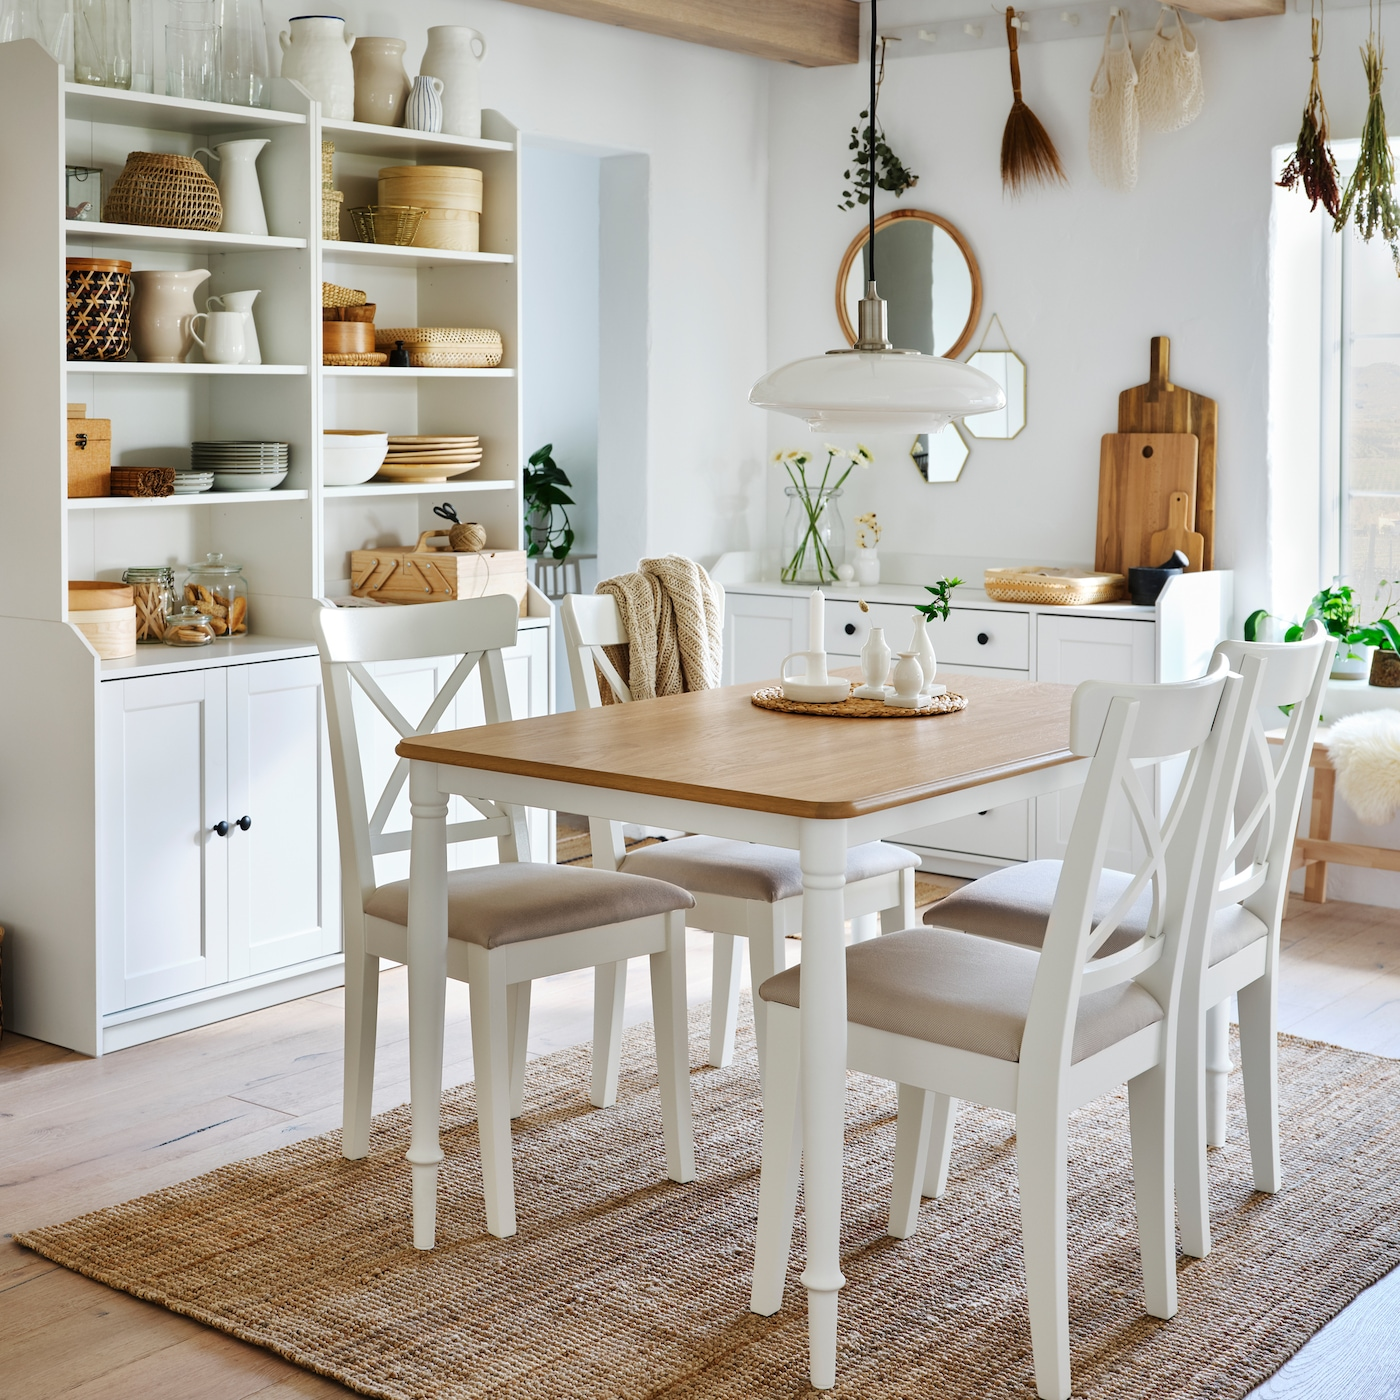 Dining Gallery Ikea